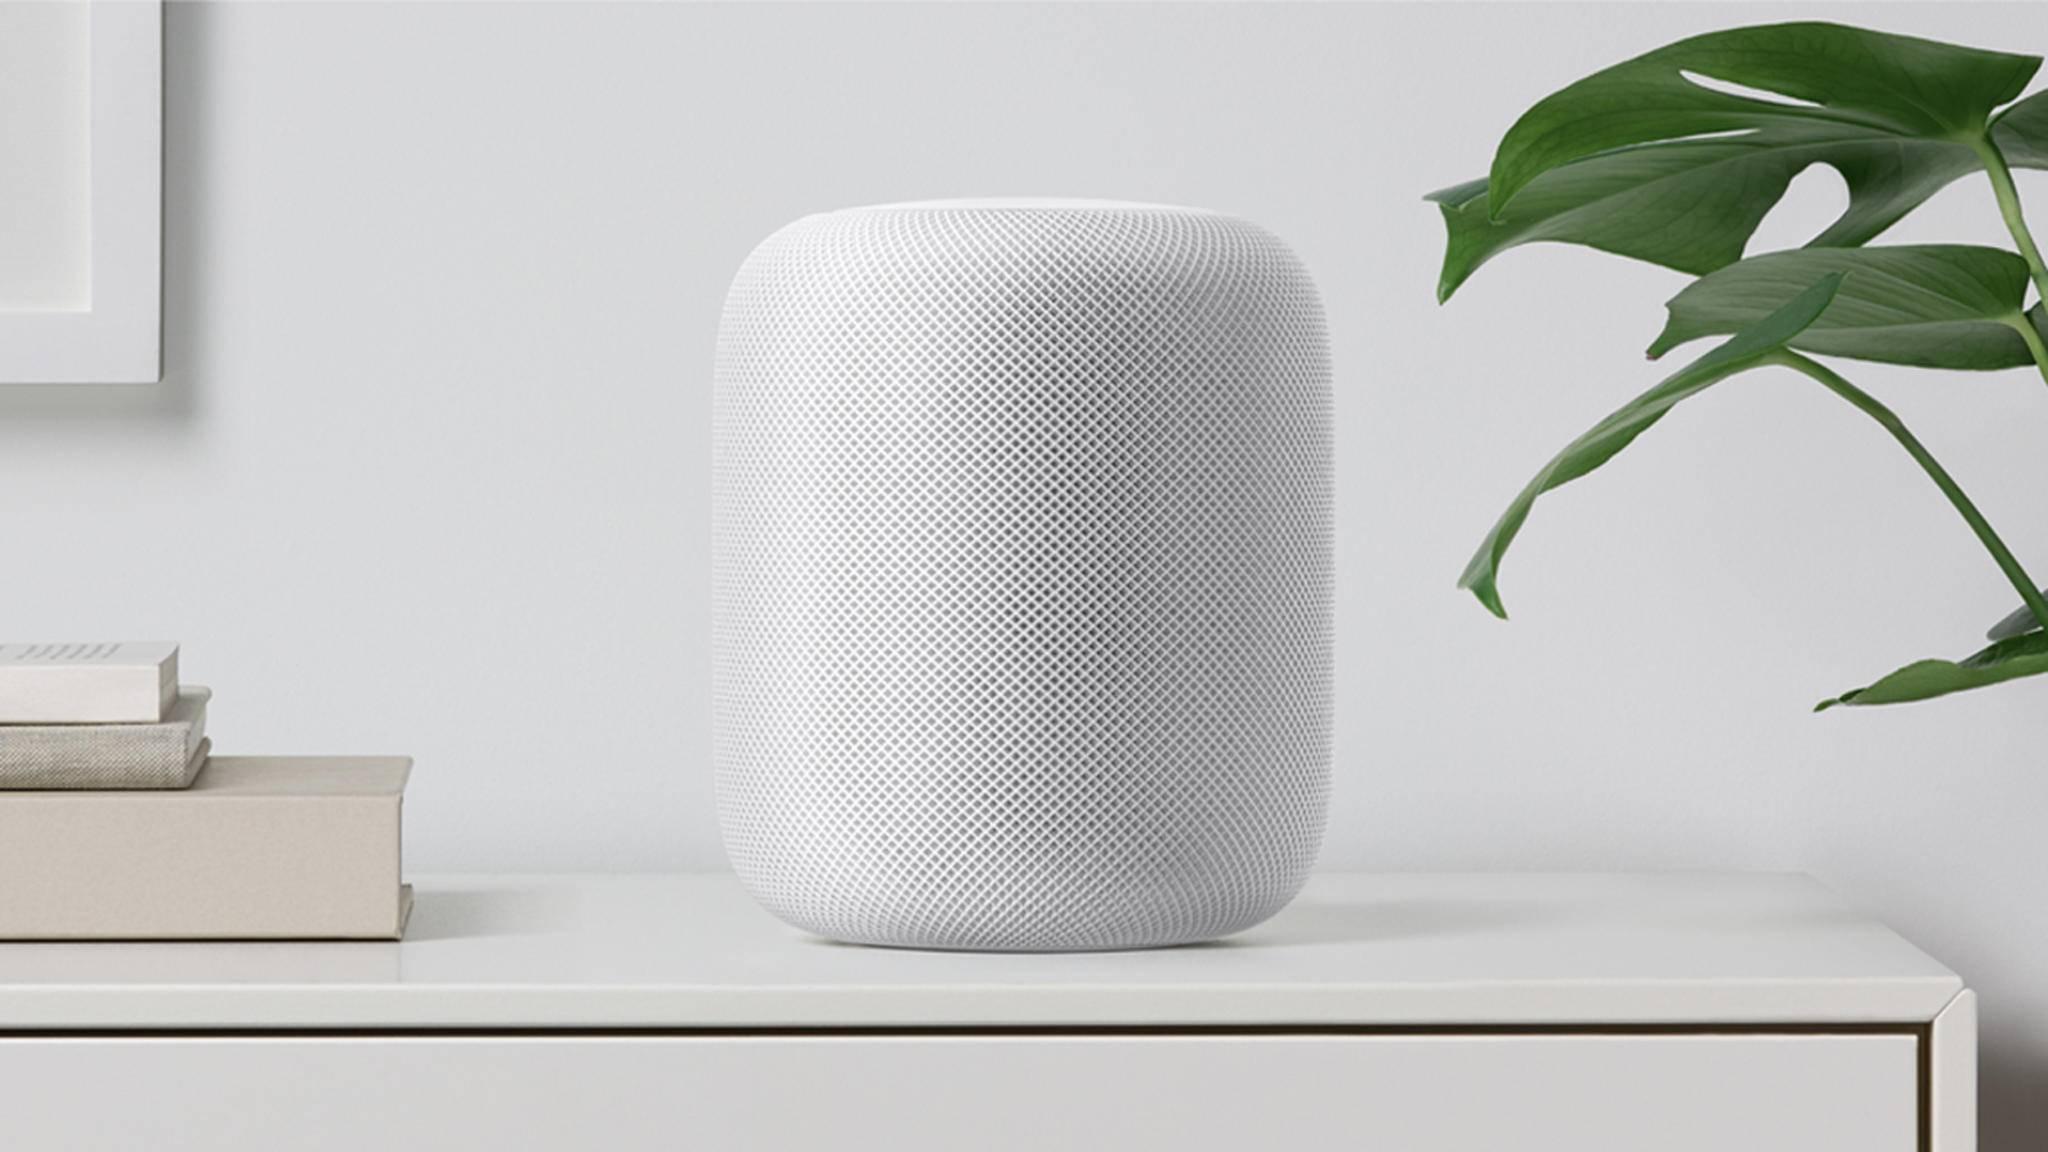 Apple möchte beim HomePod streng auf den Datenschutz achten.